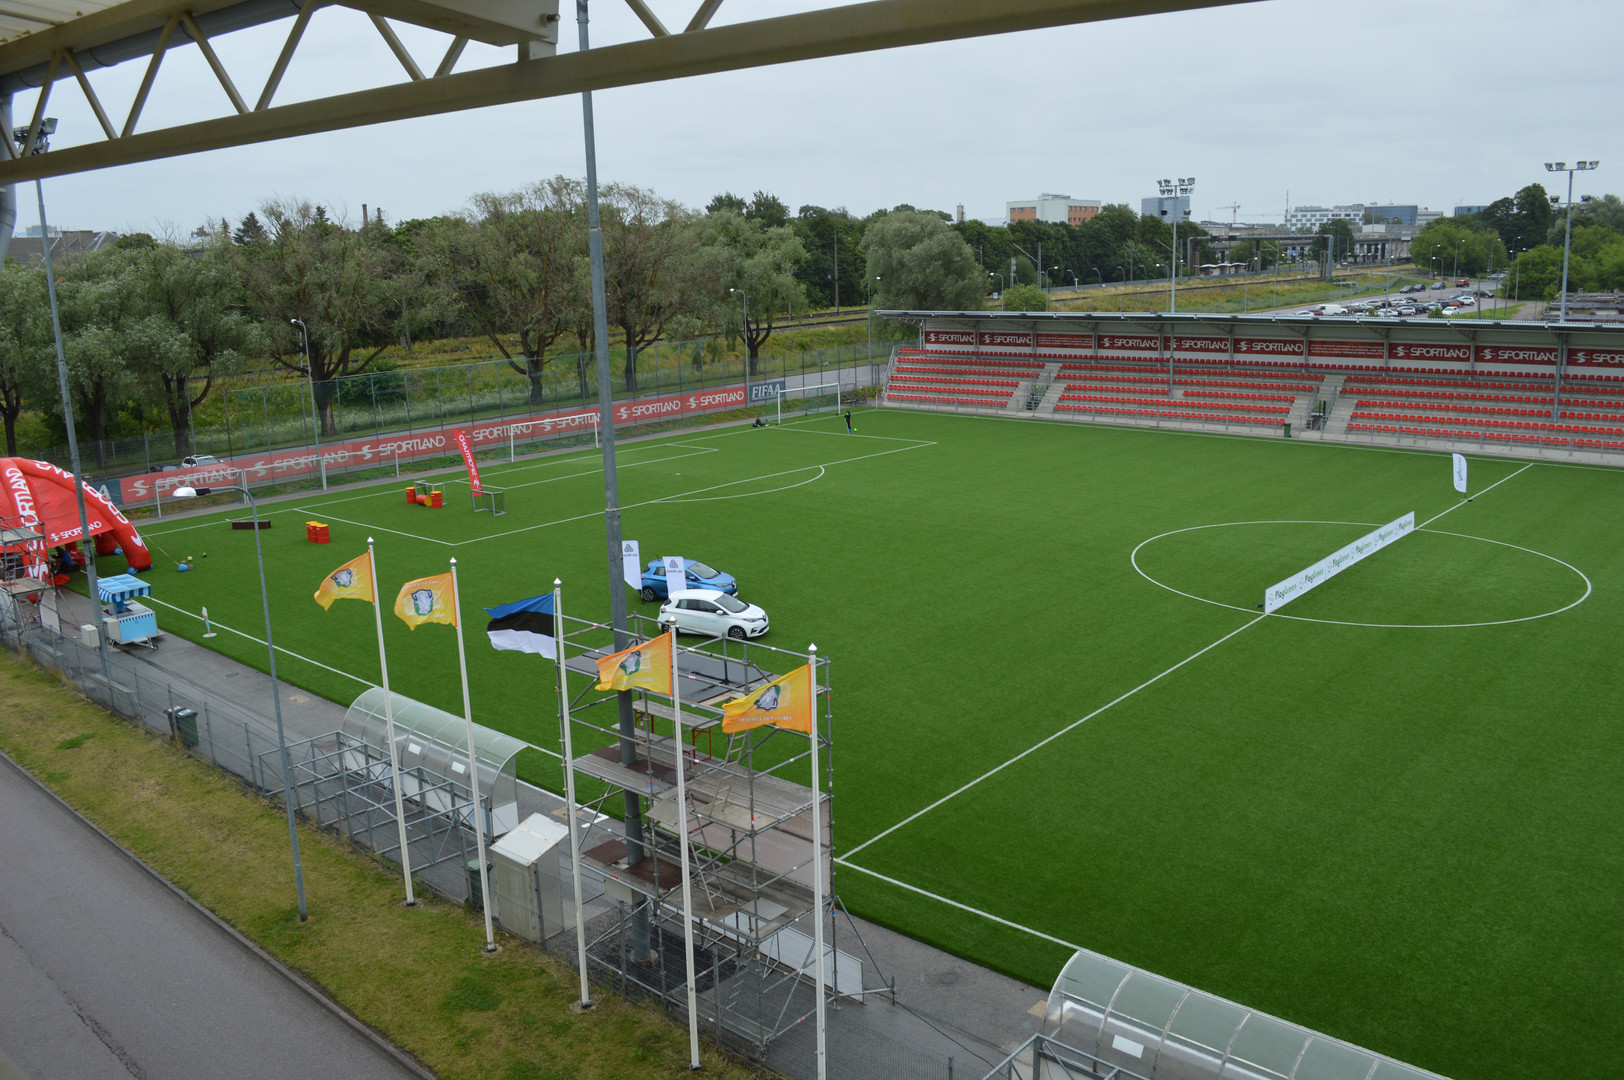 PG Dau 04.07.2020 stadion is rady.JPG